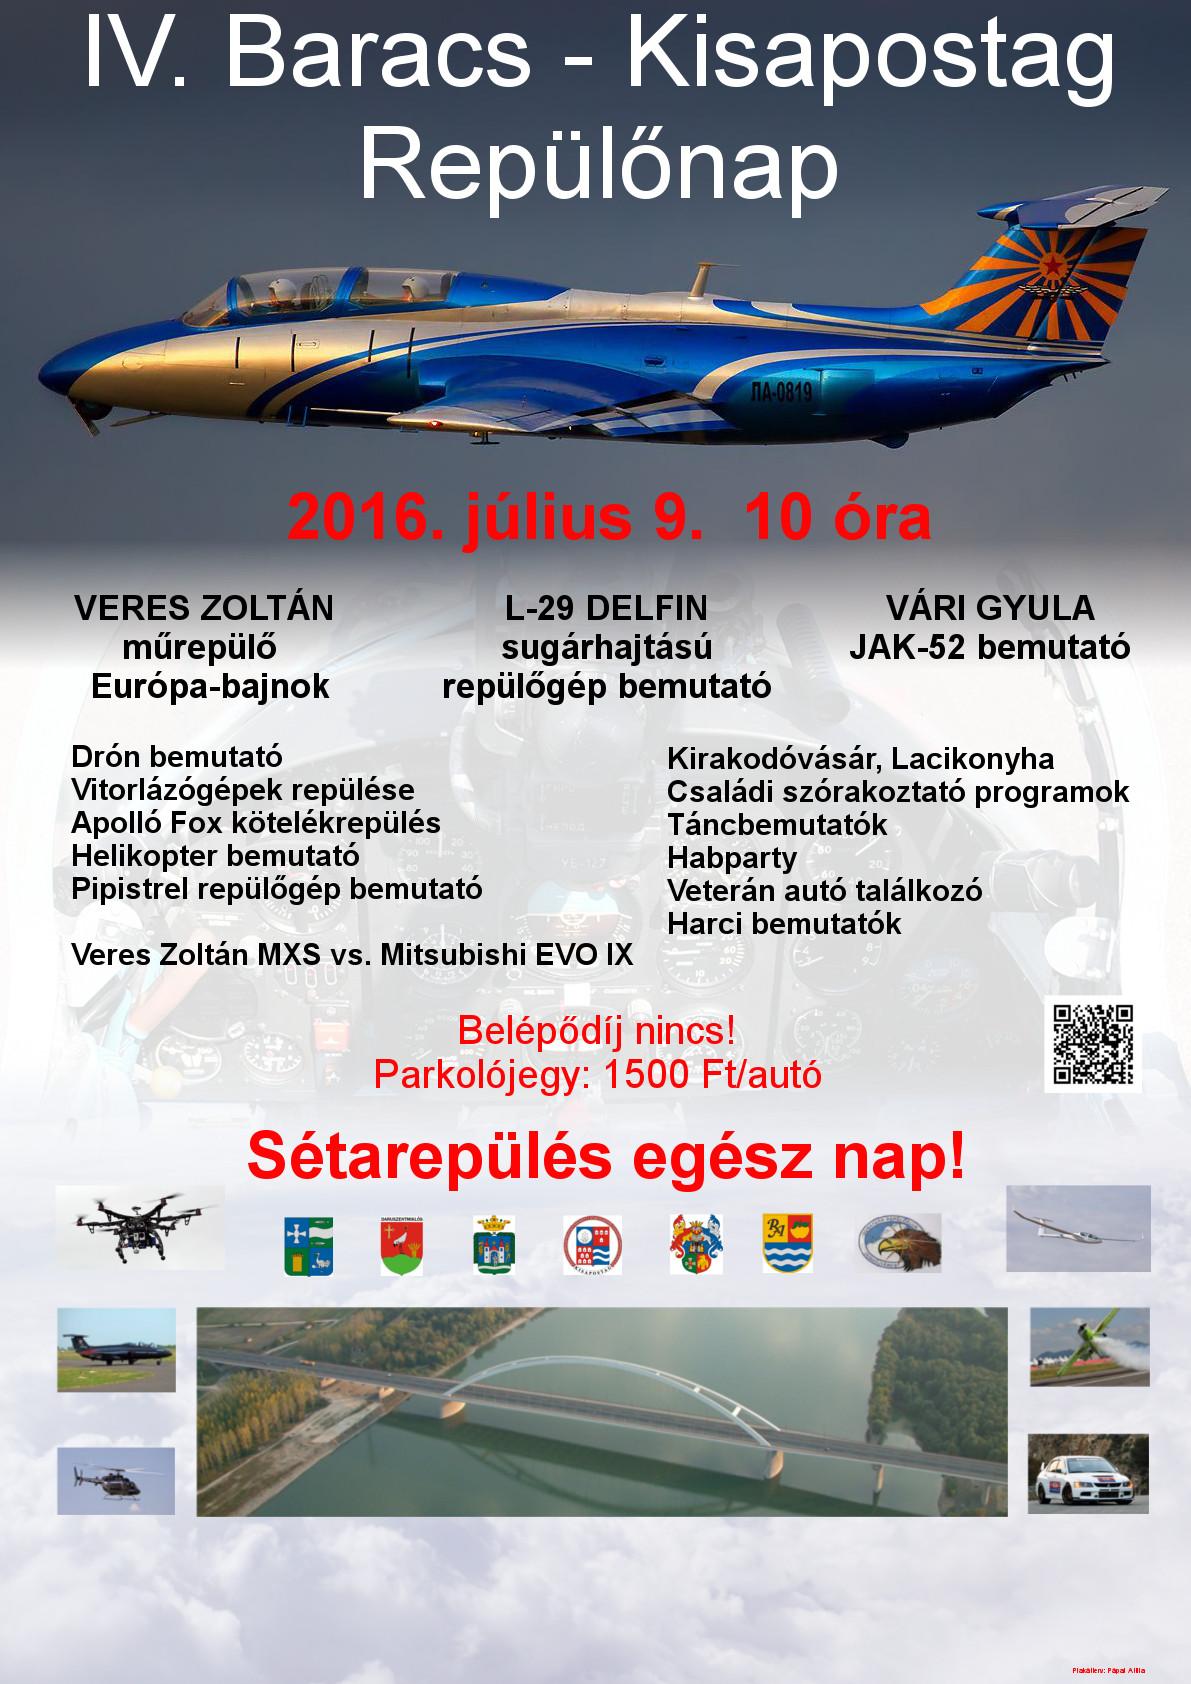 repulonap2016